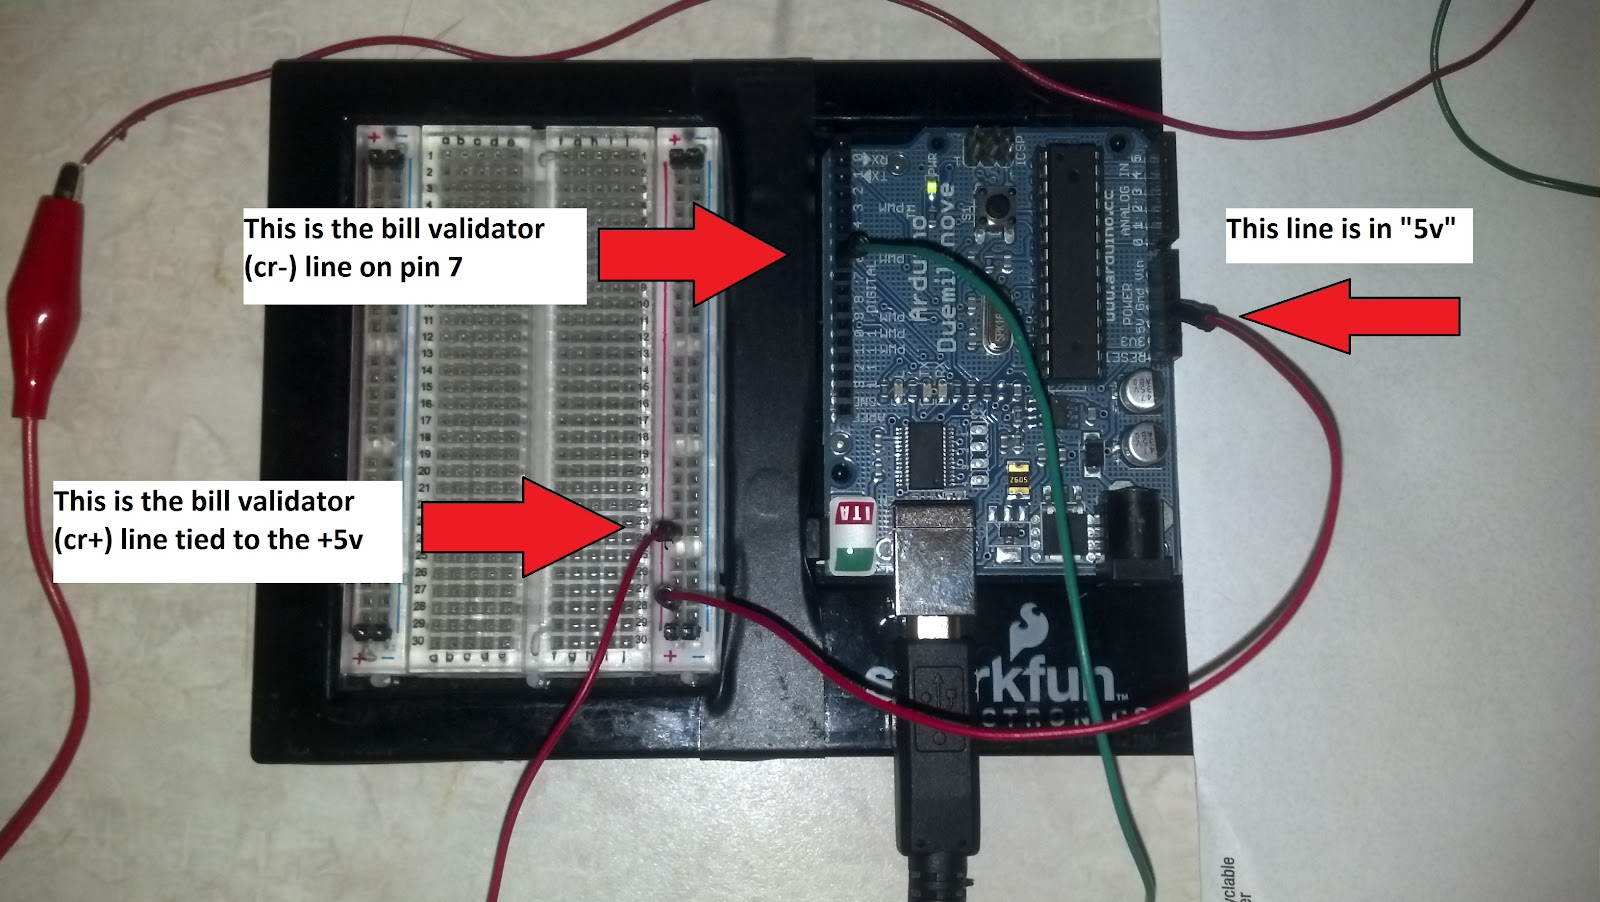 use case diagram vending machine john deere gator power wheels wiring mei bill acceptor library